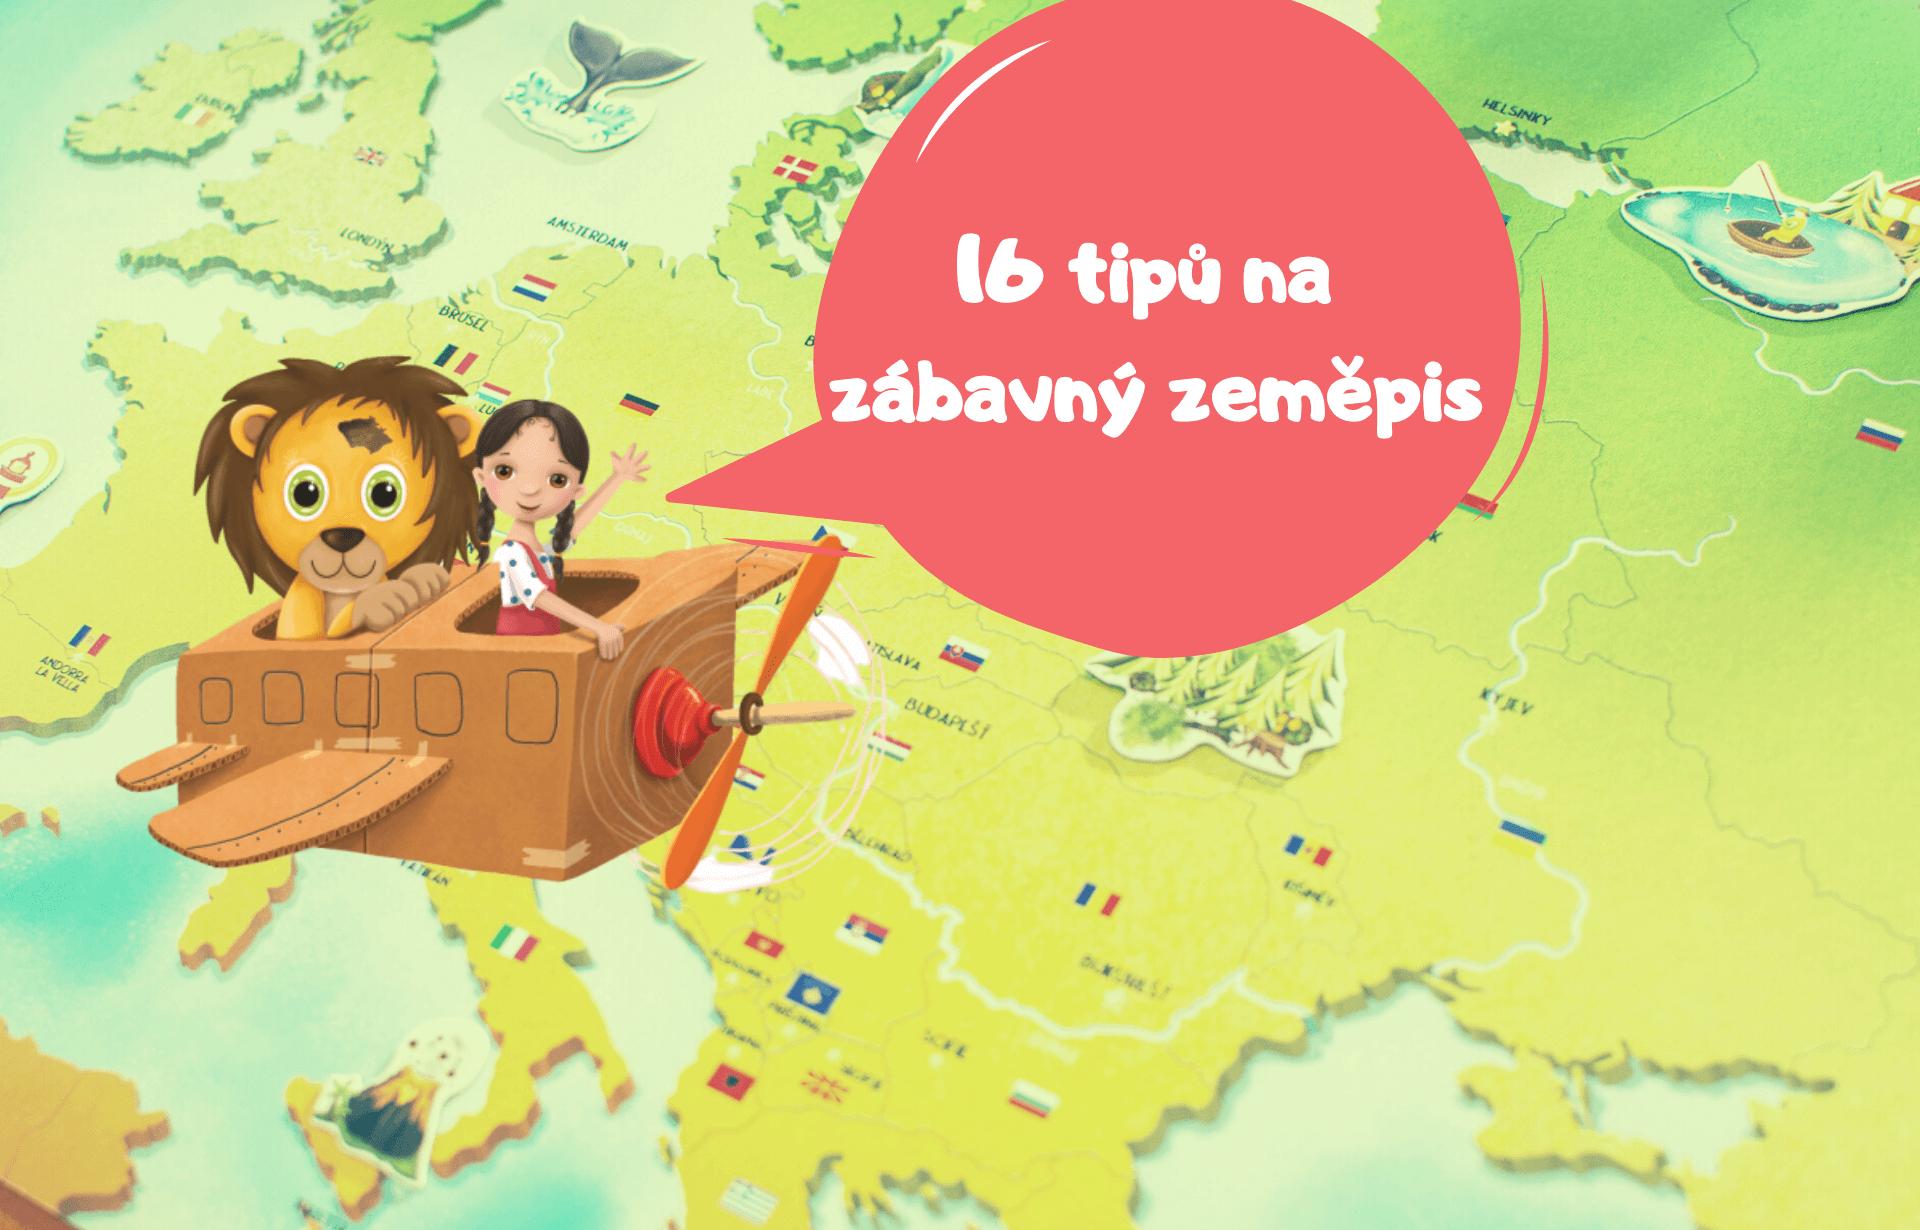 zábavný zeměpis